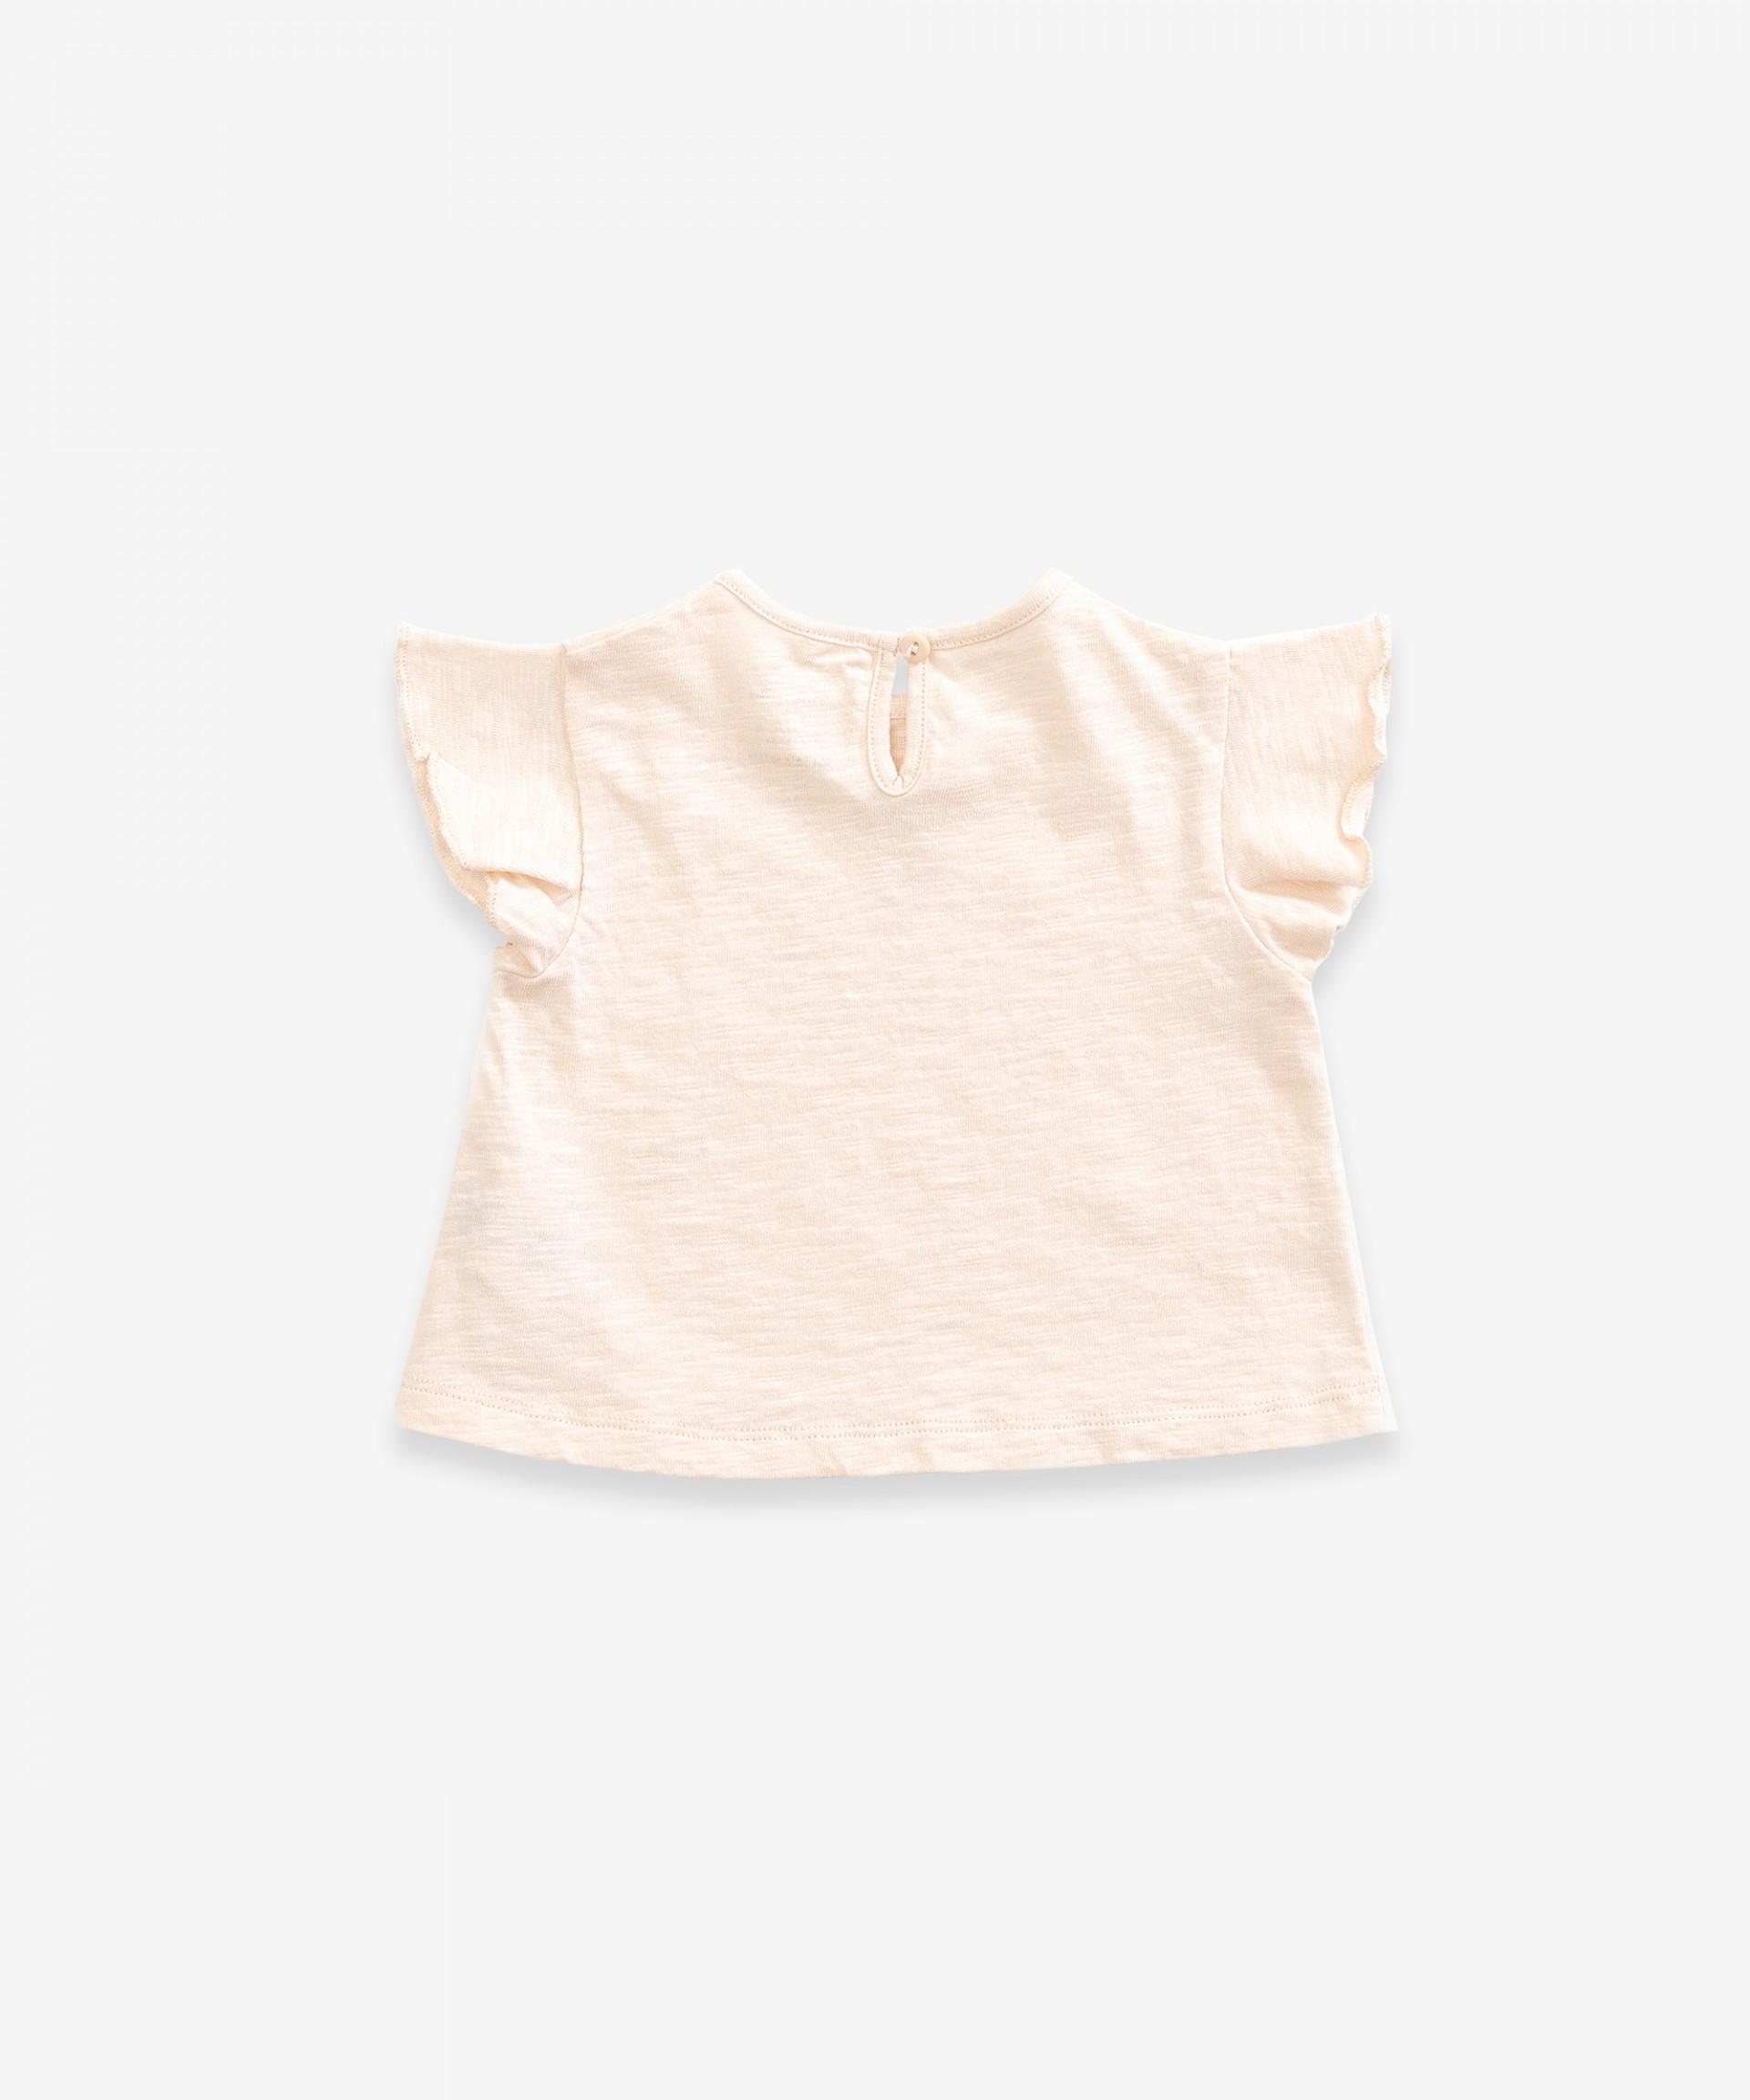 Camiseta de algodón orgánico | Weaving